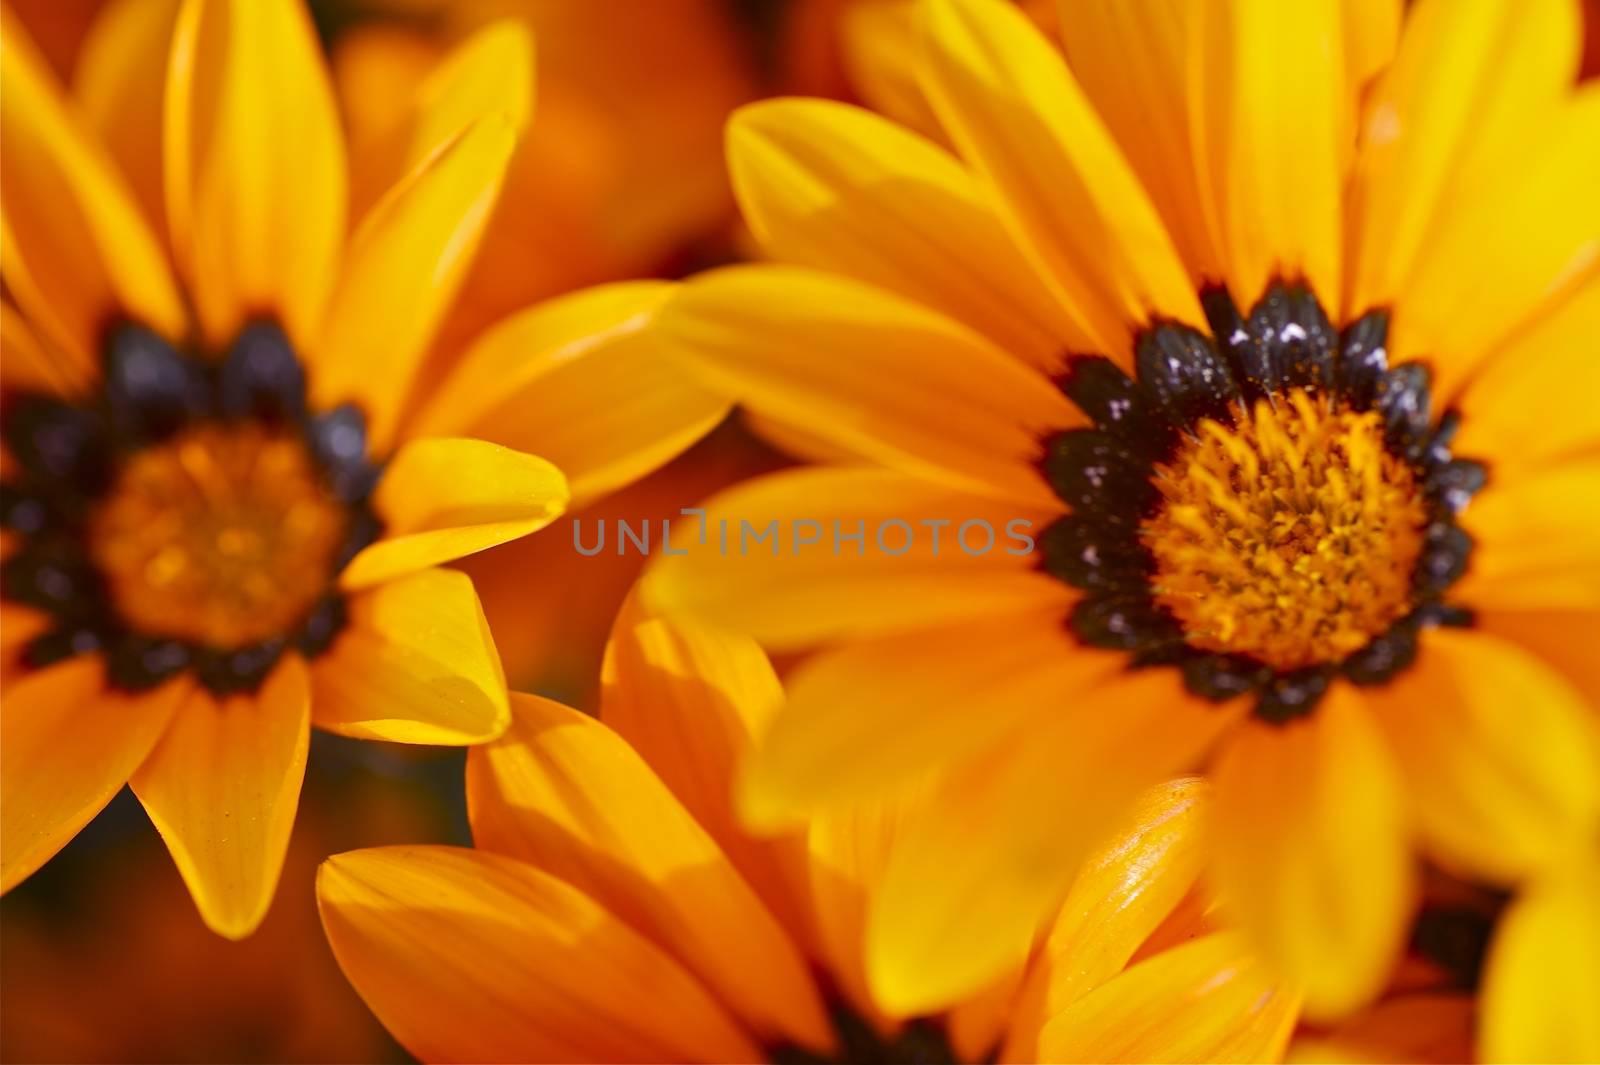 Orange Beauty. Beautiful Small Orange Spring Flowers. Macro Photography. Flower Photo Collection.